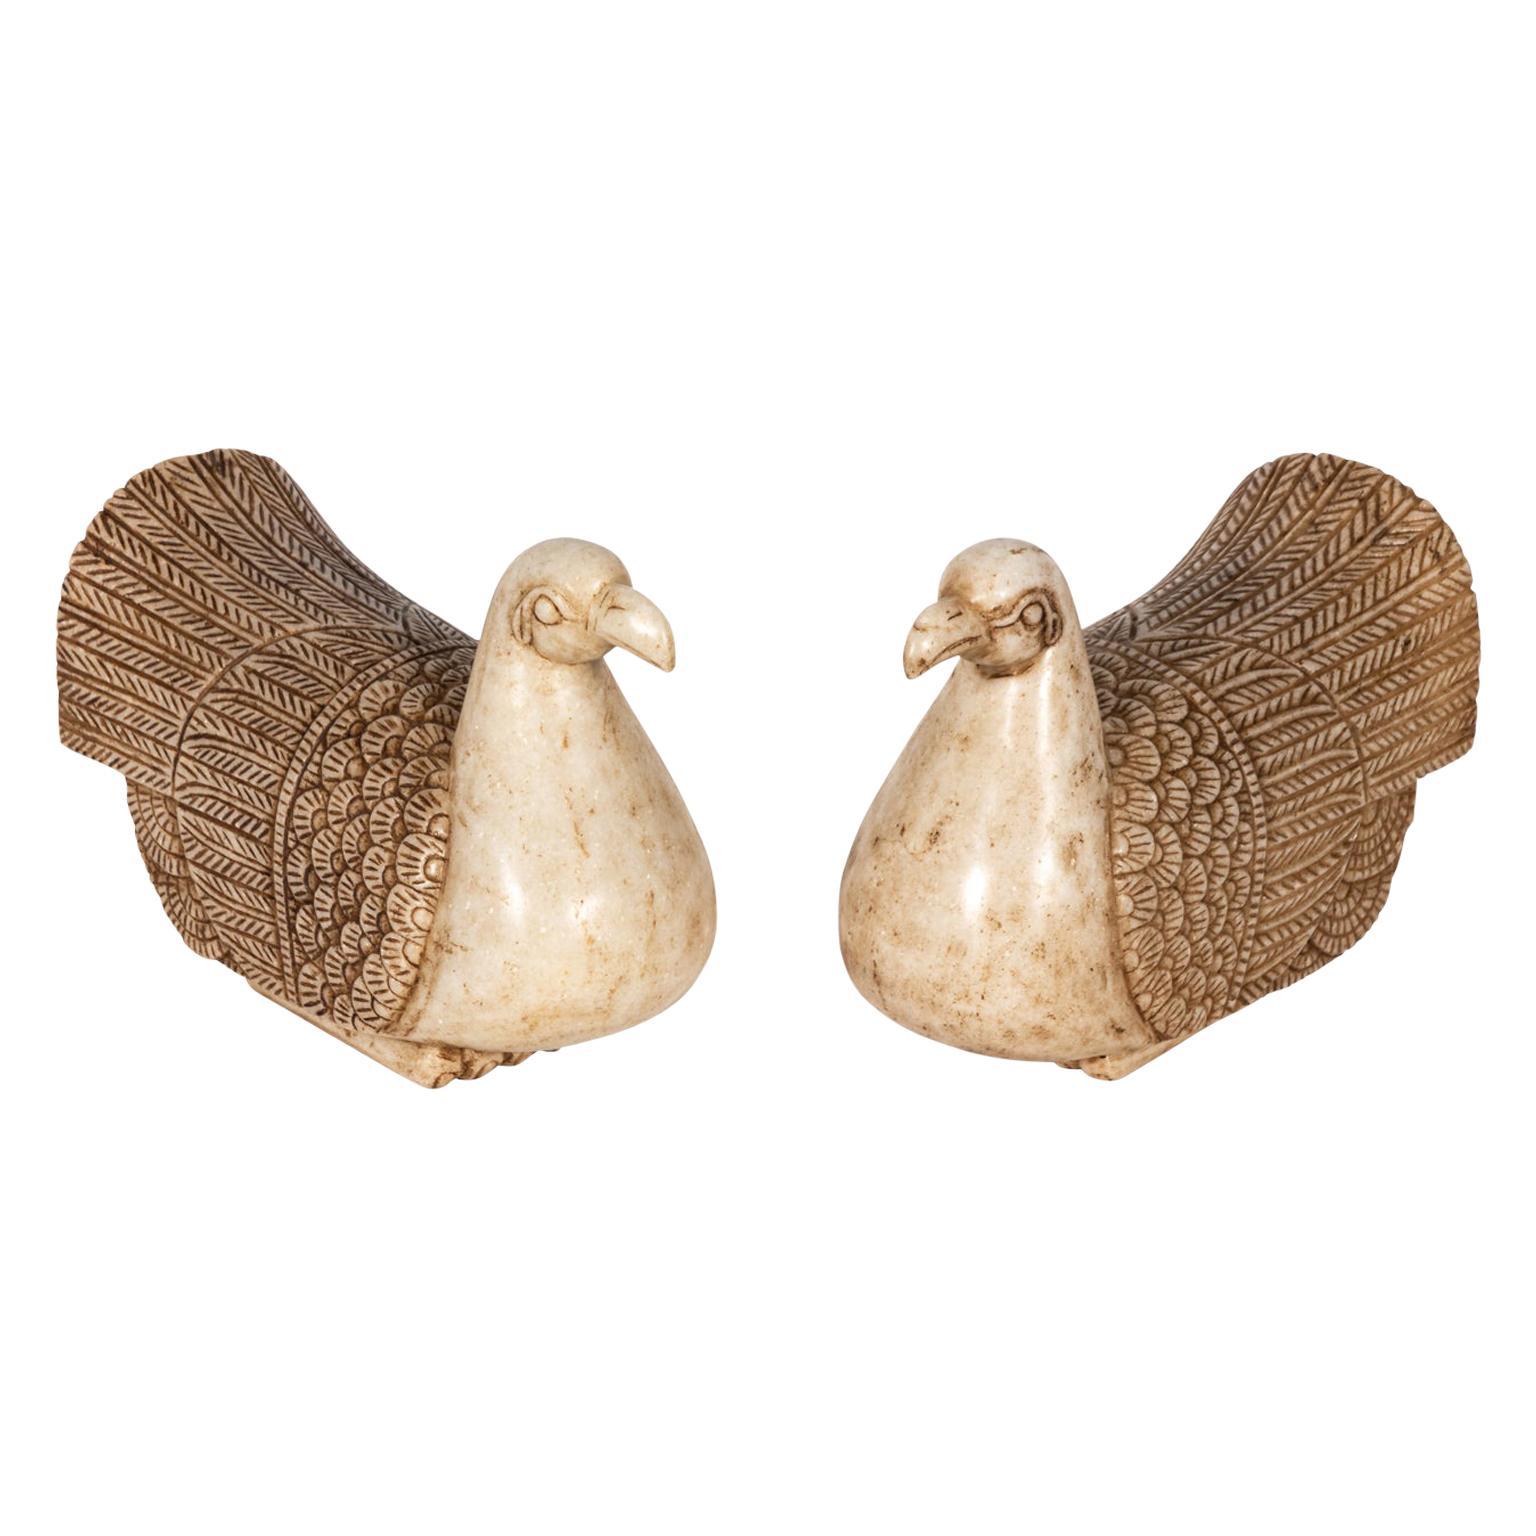 Pair of Carved Marble Ducks